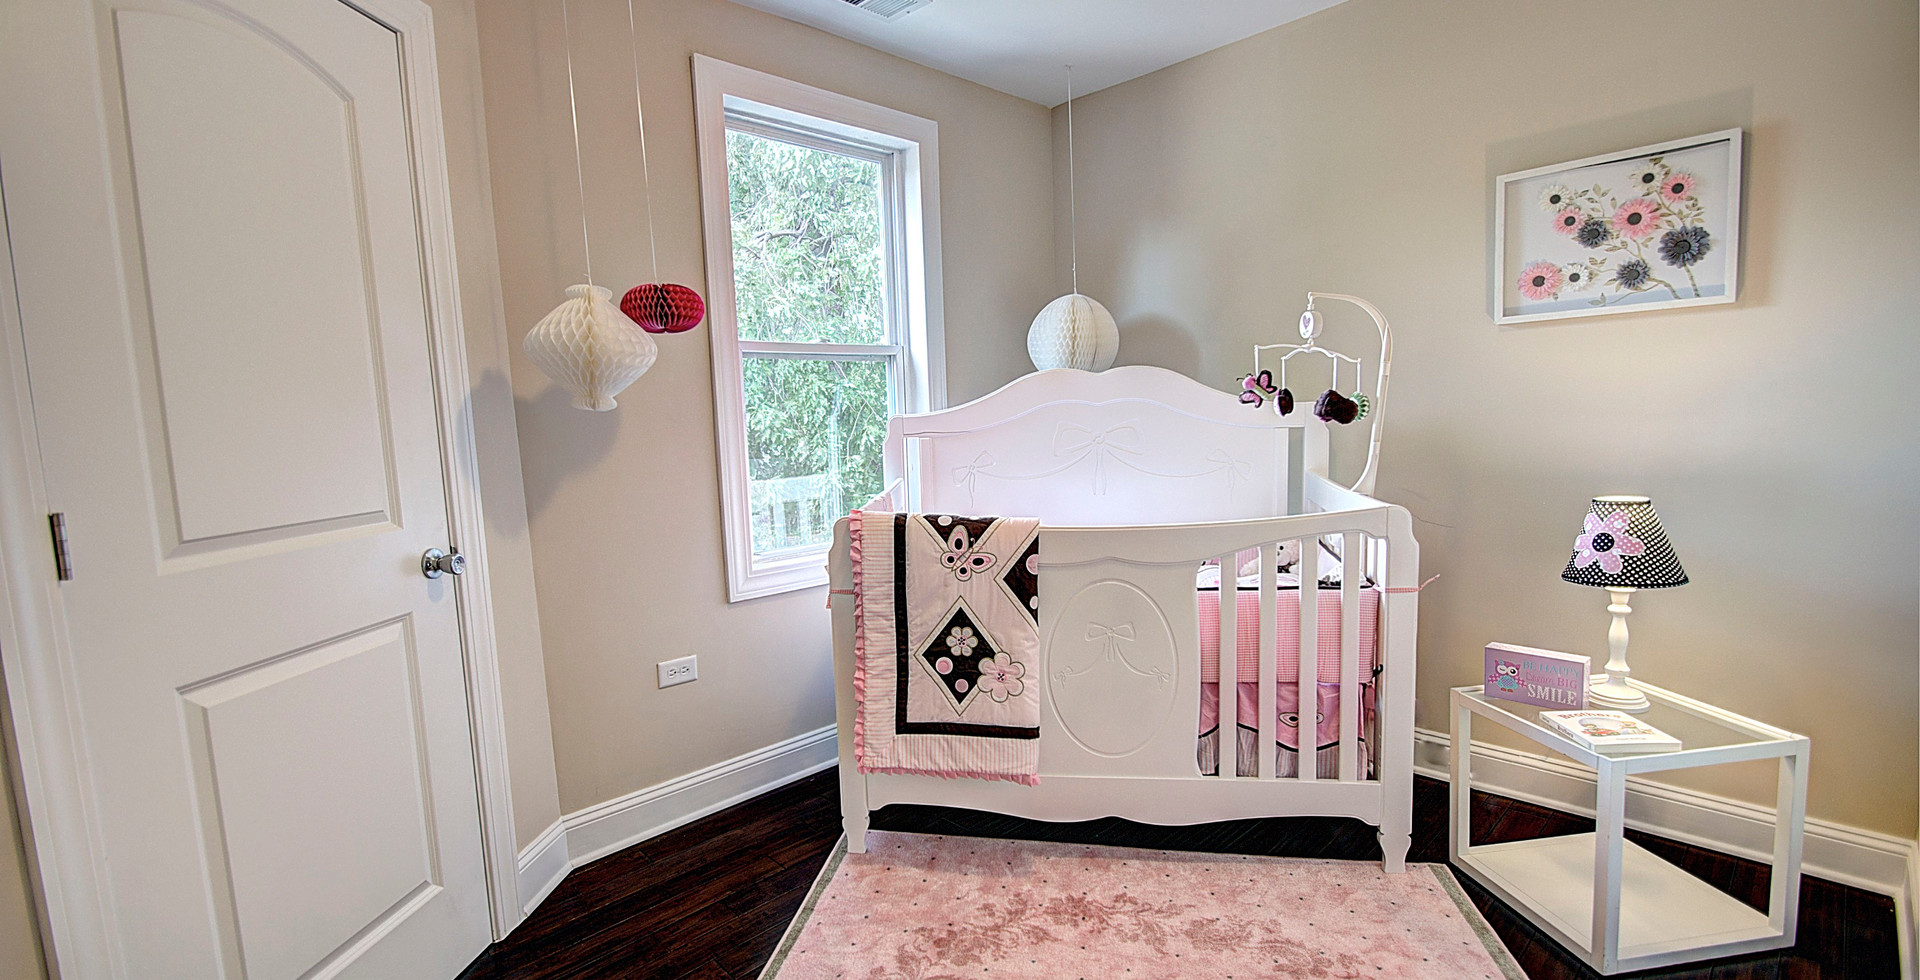 Bedroom in Palos Hills designed by MRM Home Design.jpg